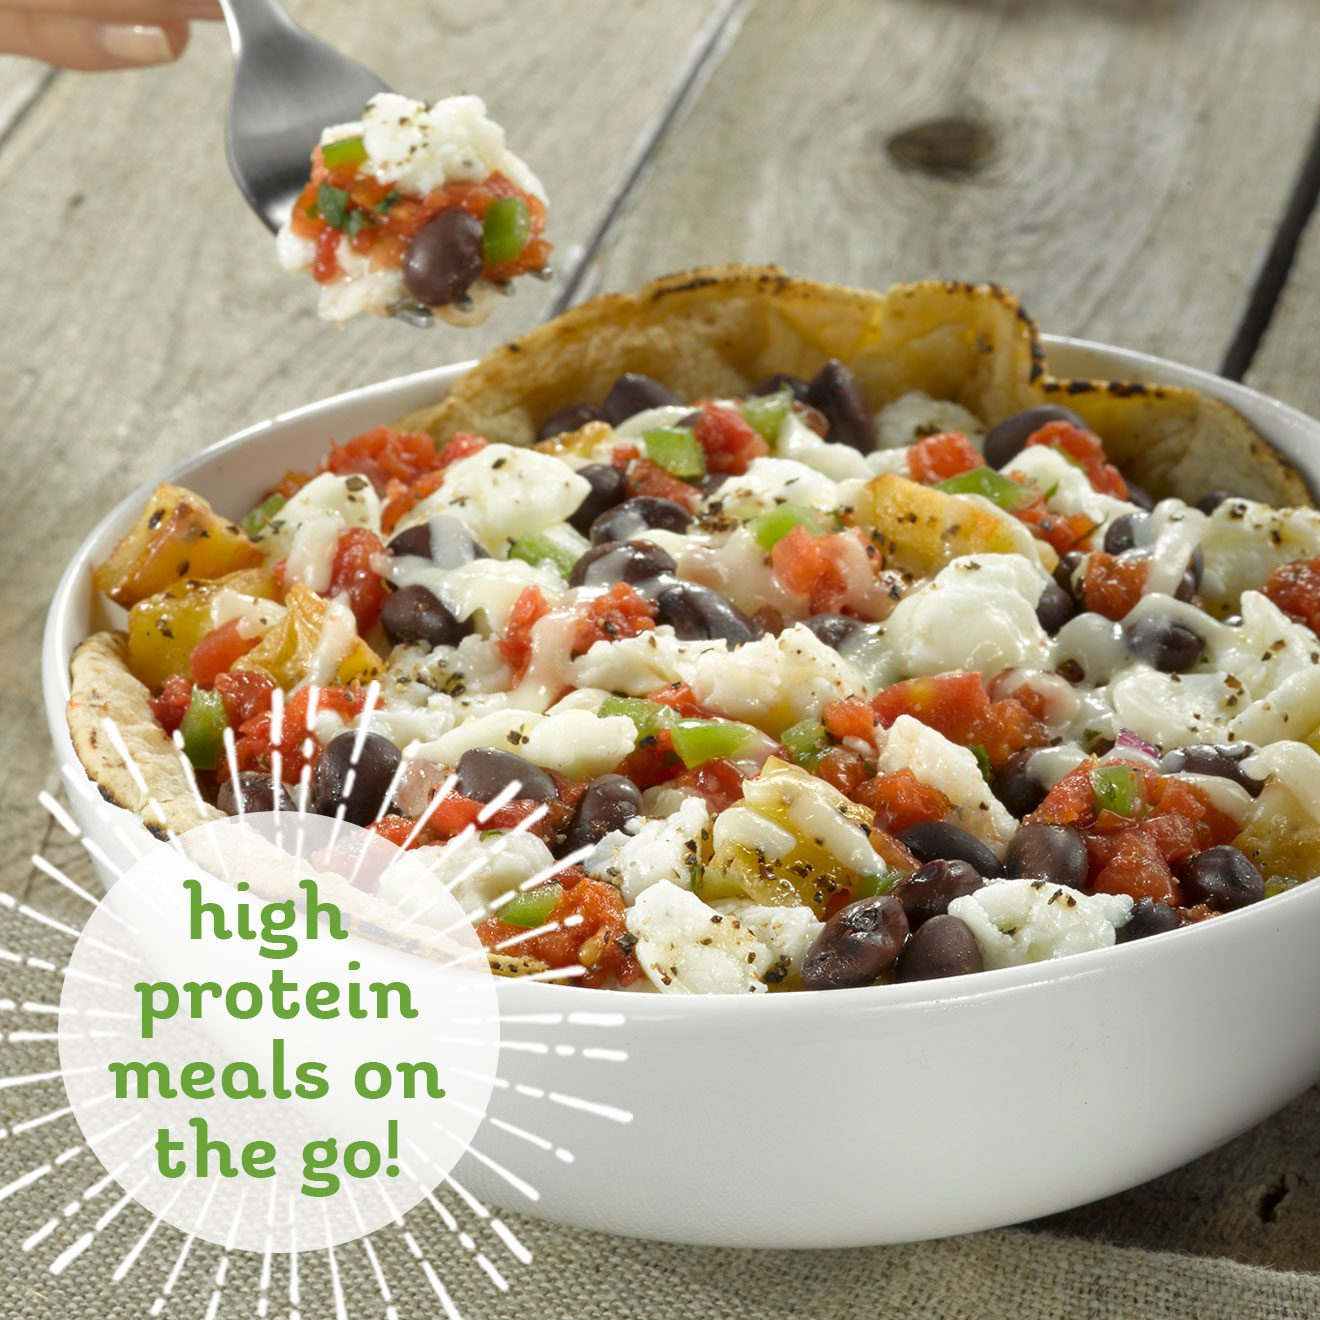 Dr. Praeger's bowls are organic and non-GMO